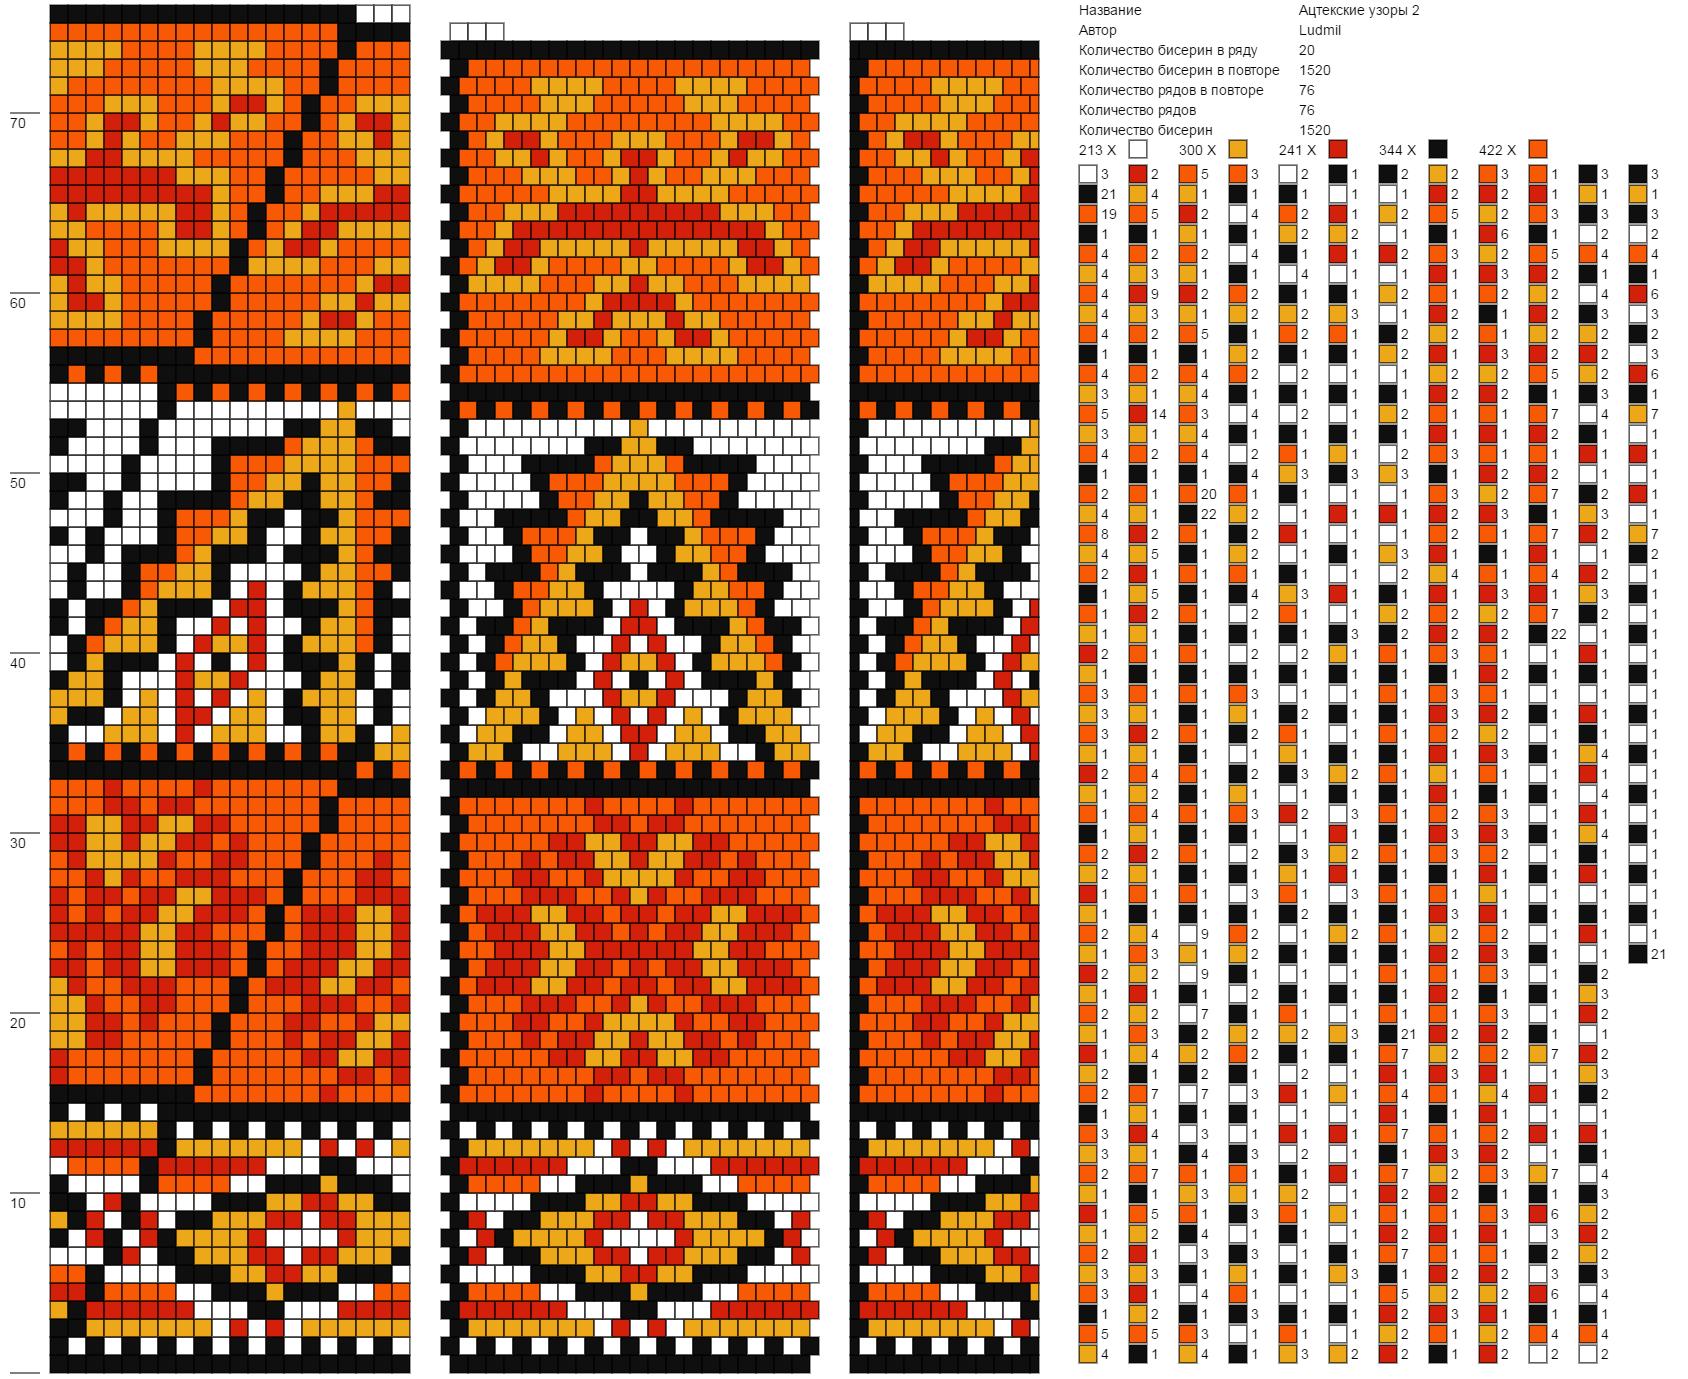 Ацтекские узоры 2